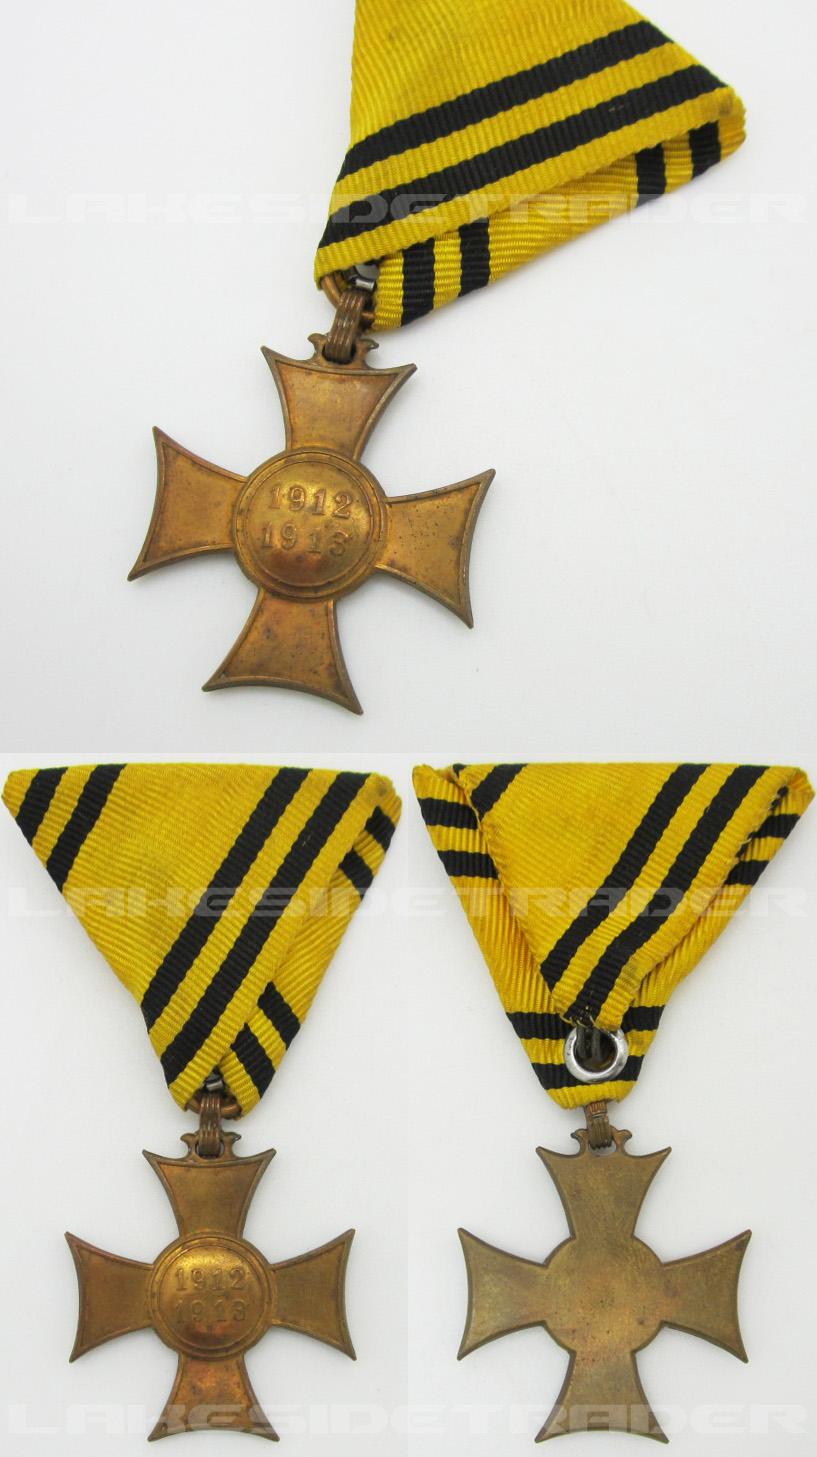 Commemorative Mobilization Cross 1912-13